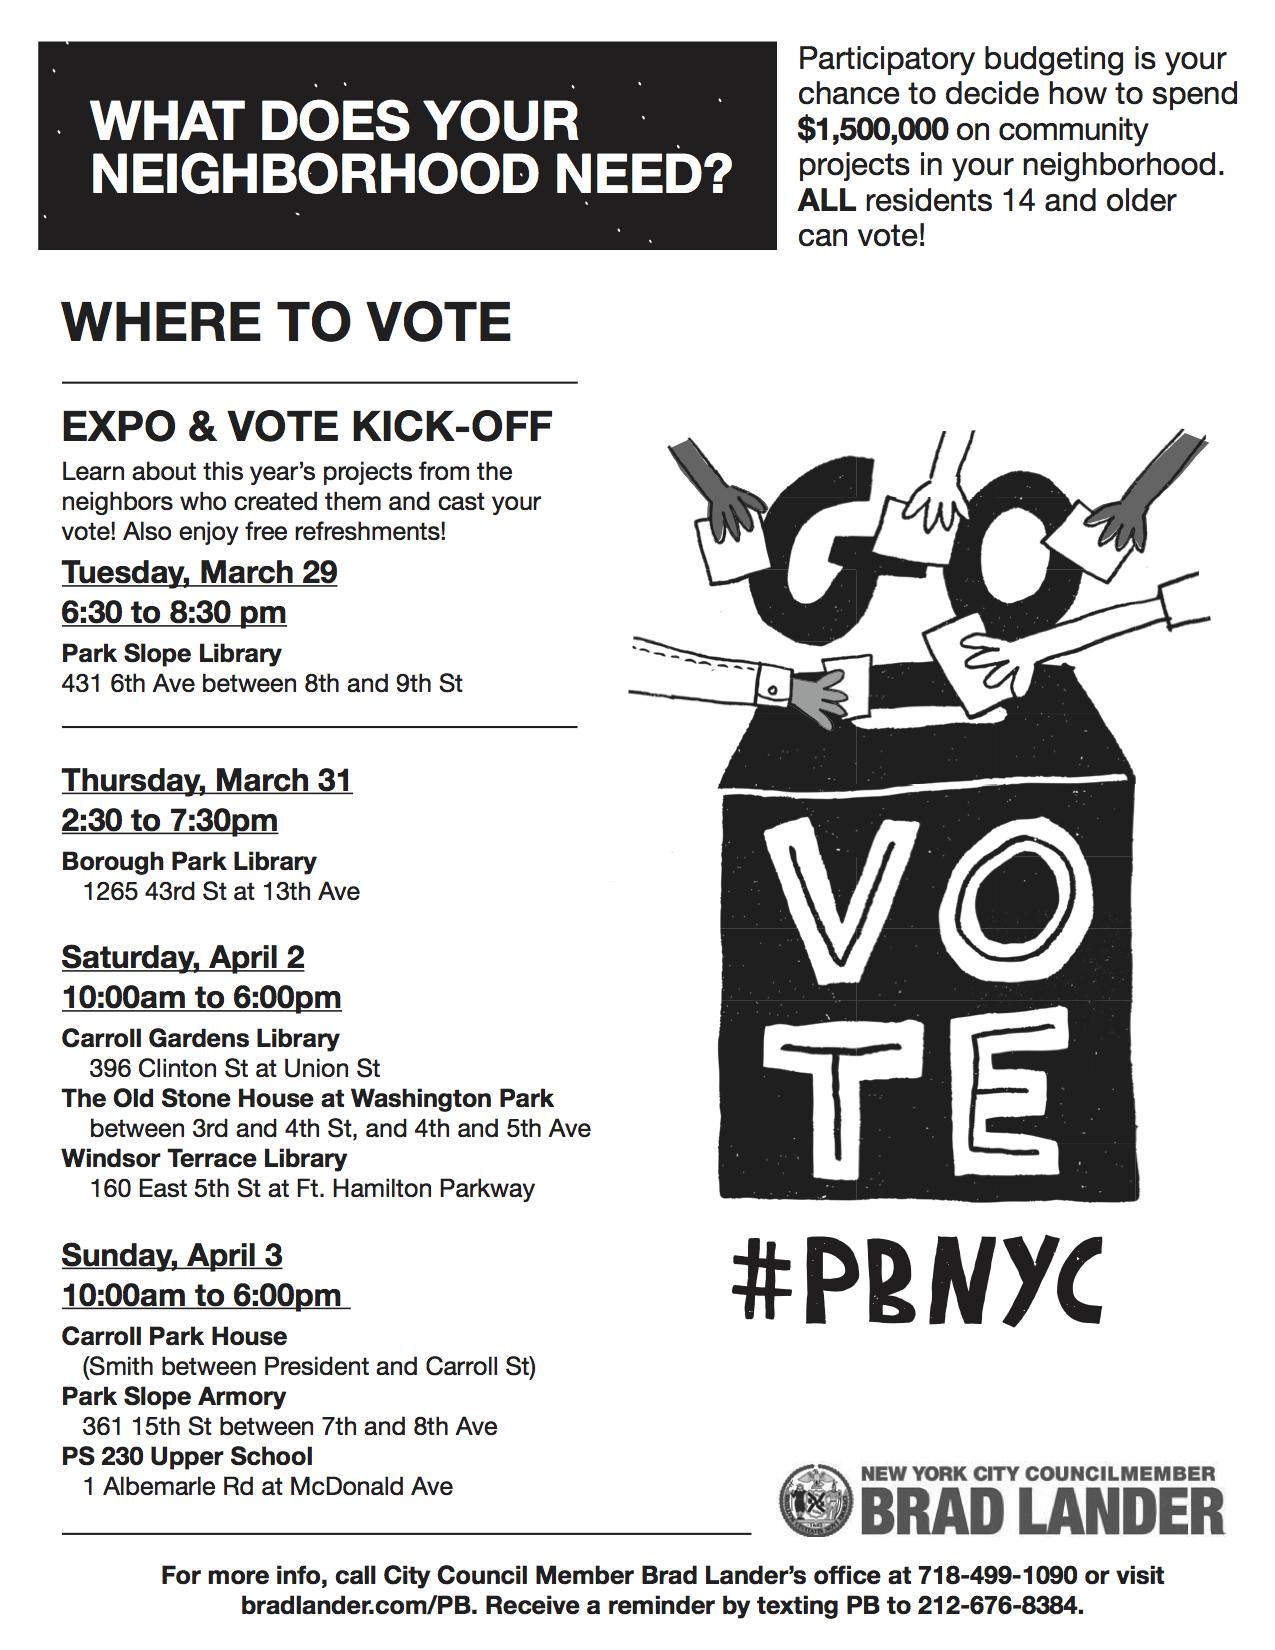 PBNYC Voting Flyer